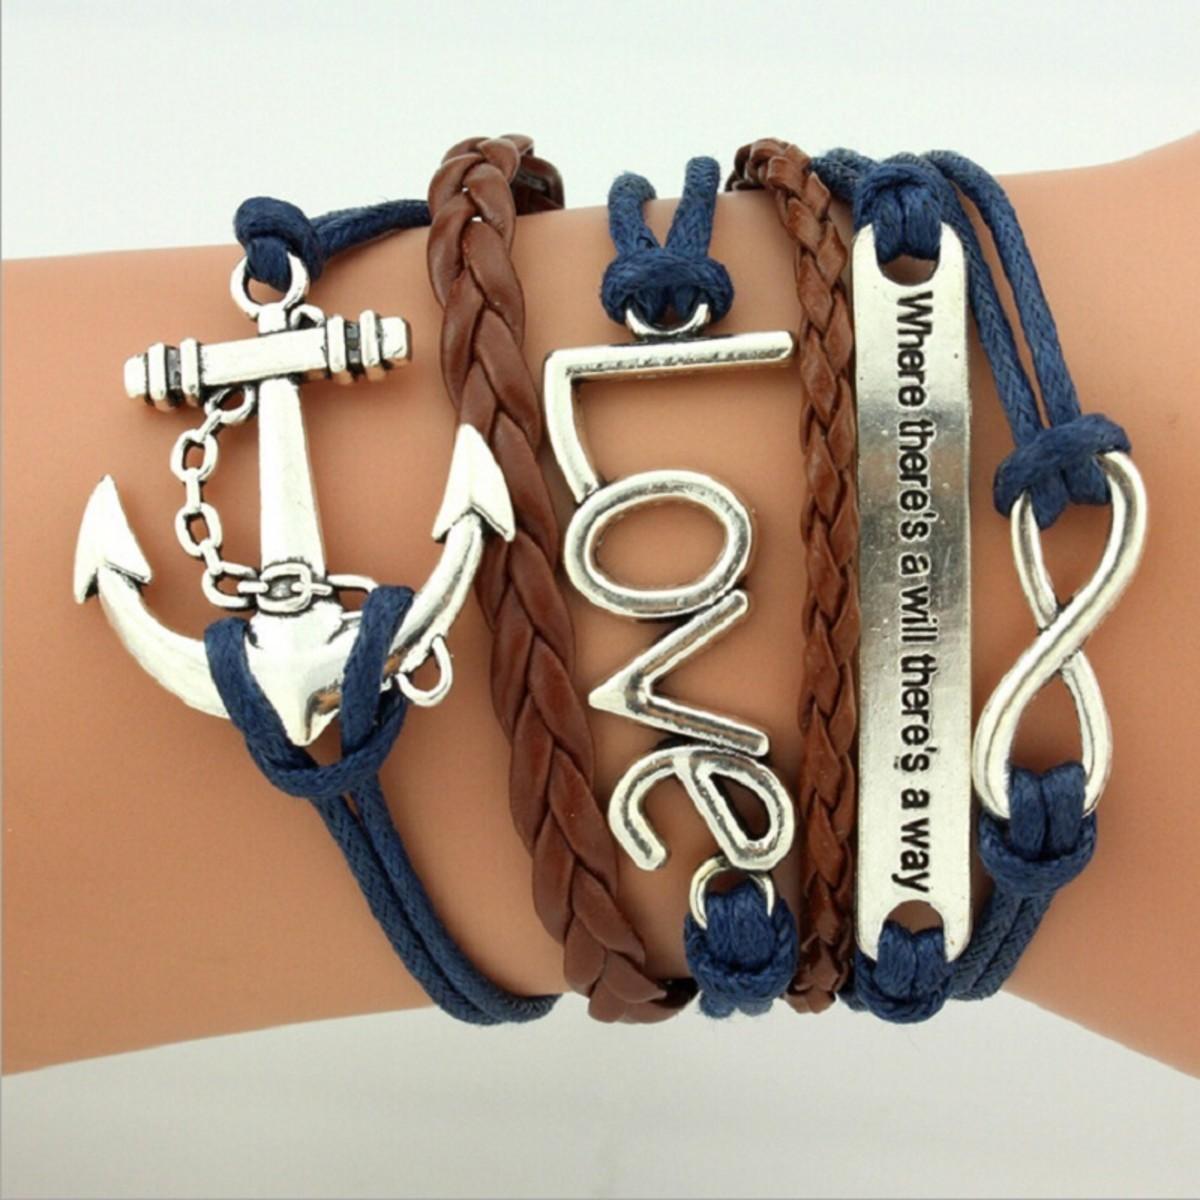 Multi-layer charm bracelets